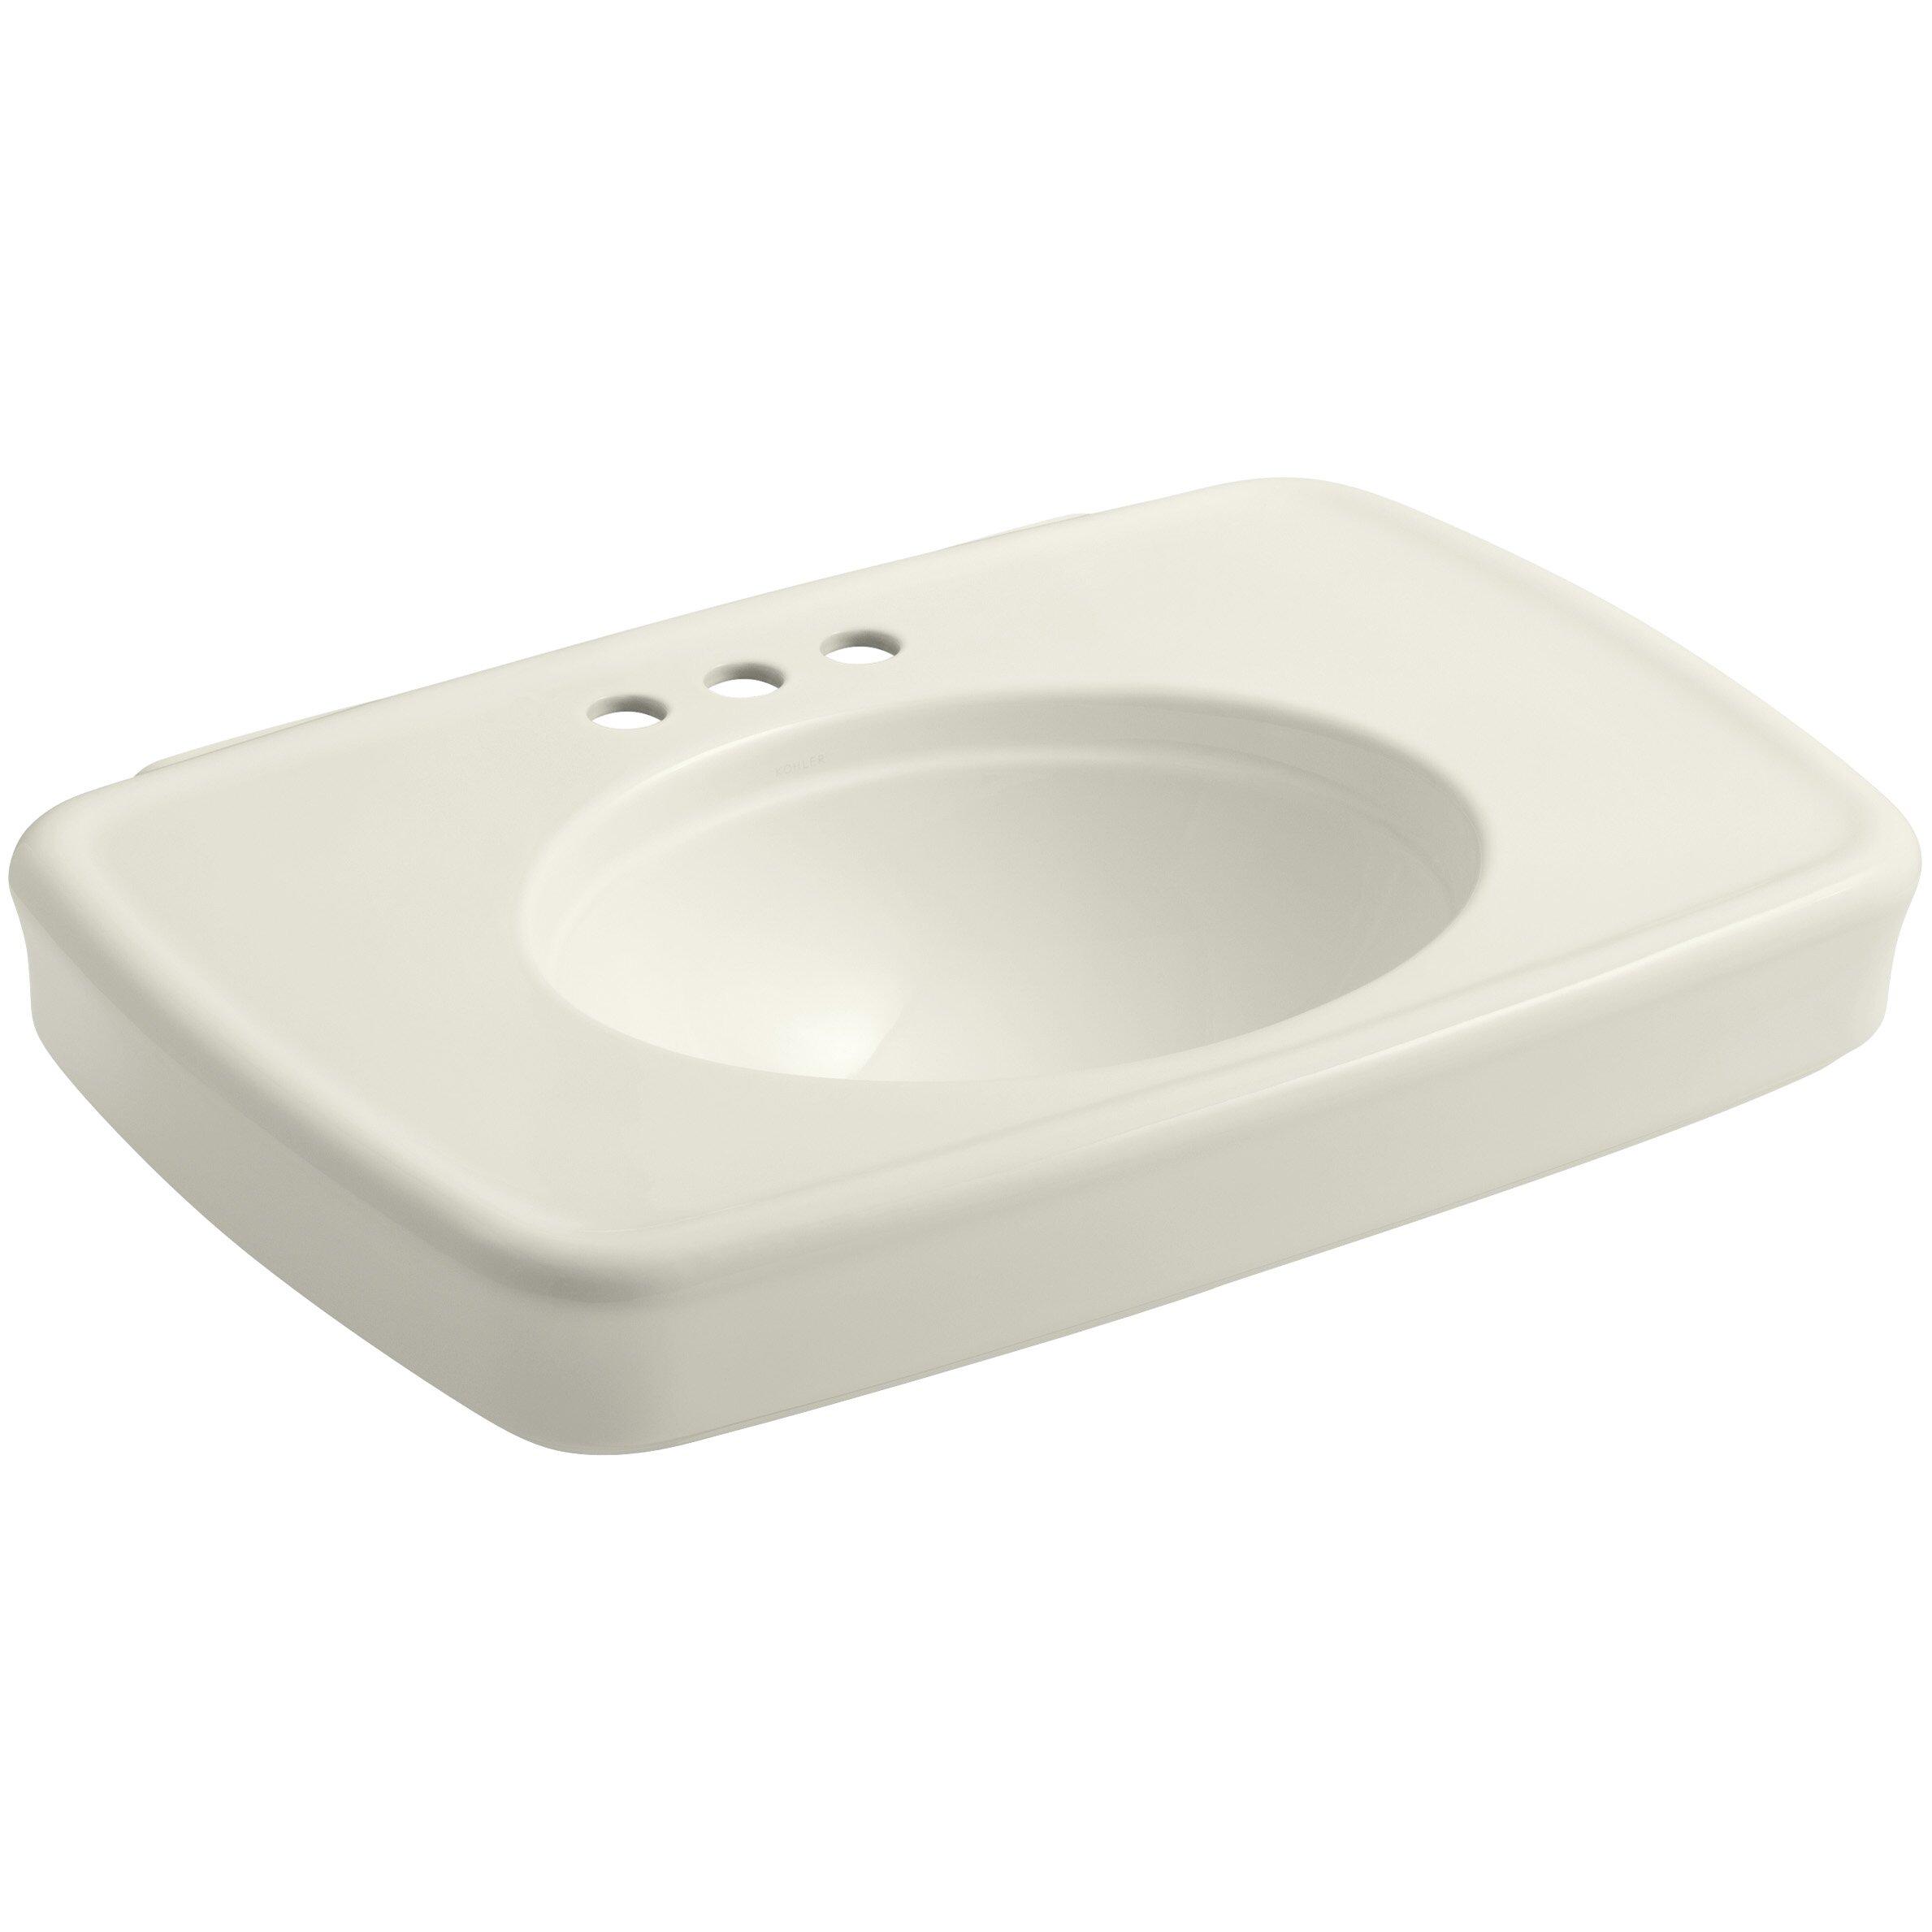 Kohler Bancroft 30 Bathroom Sink With 4 Centerset Faucet Holes Wayfair